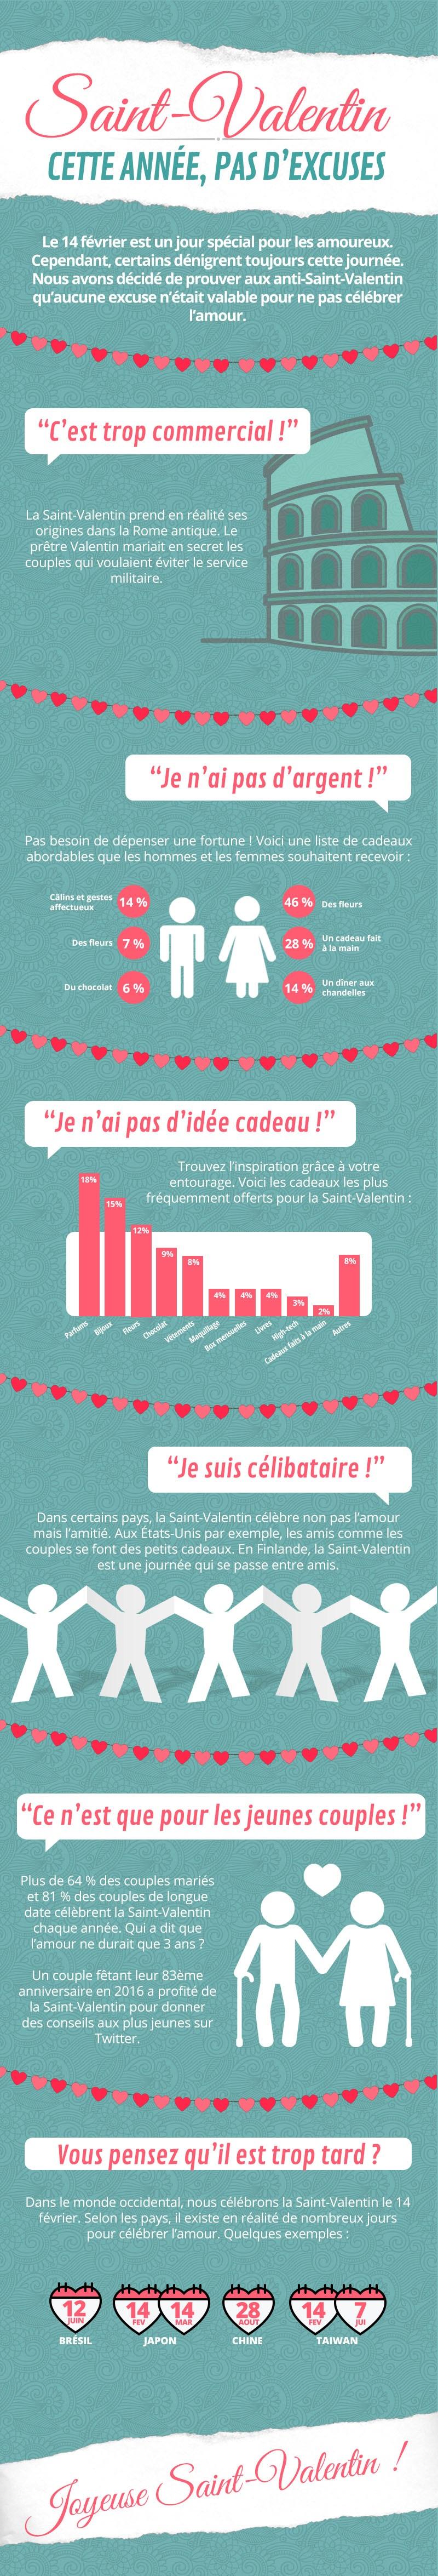 Shopalike-Saint-Valentin-Infographie